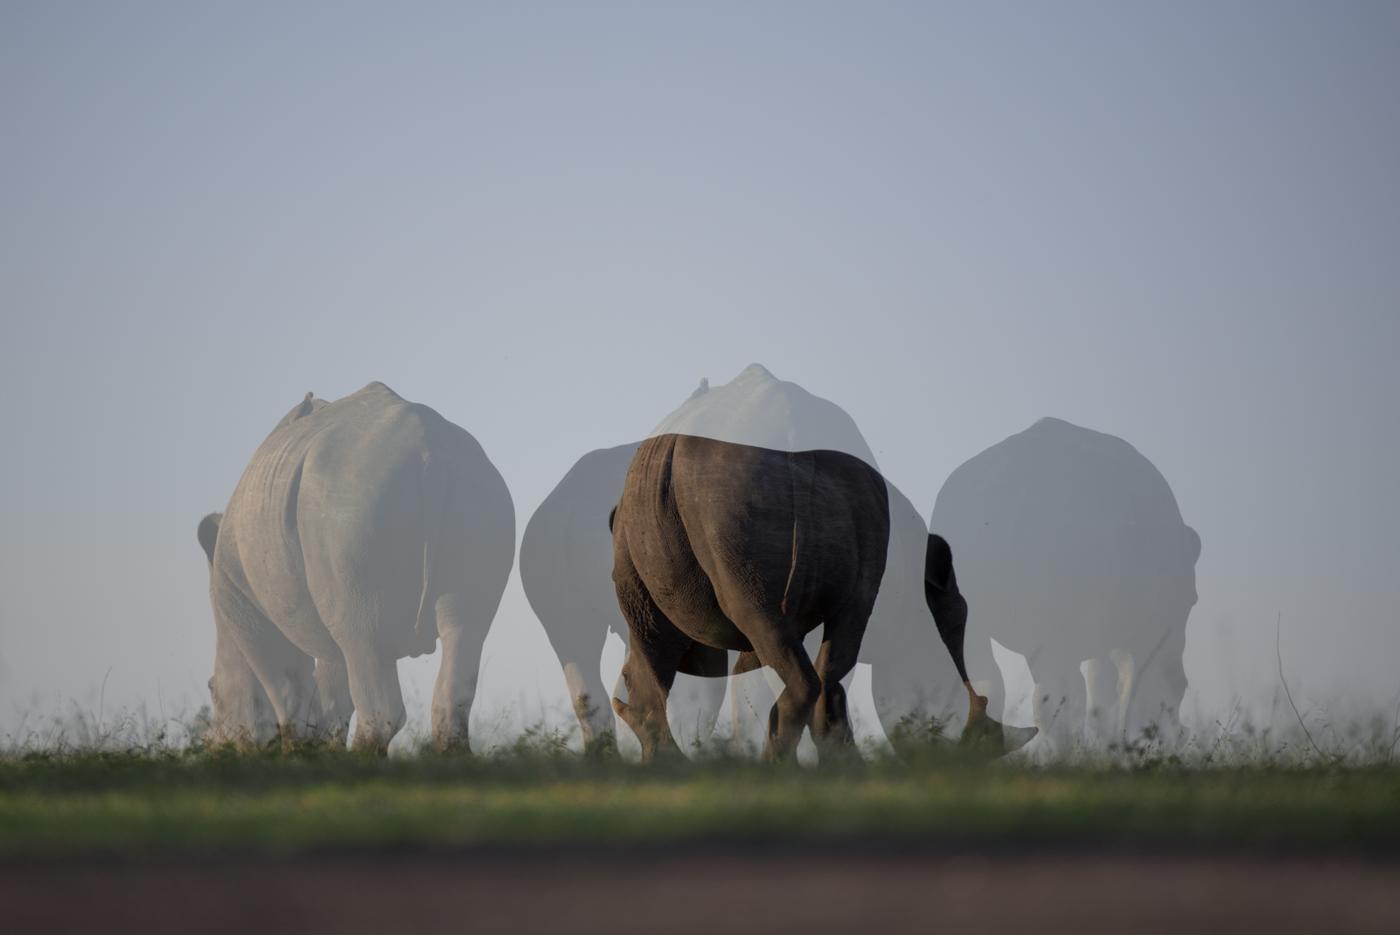 Mutliple Rhino